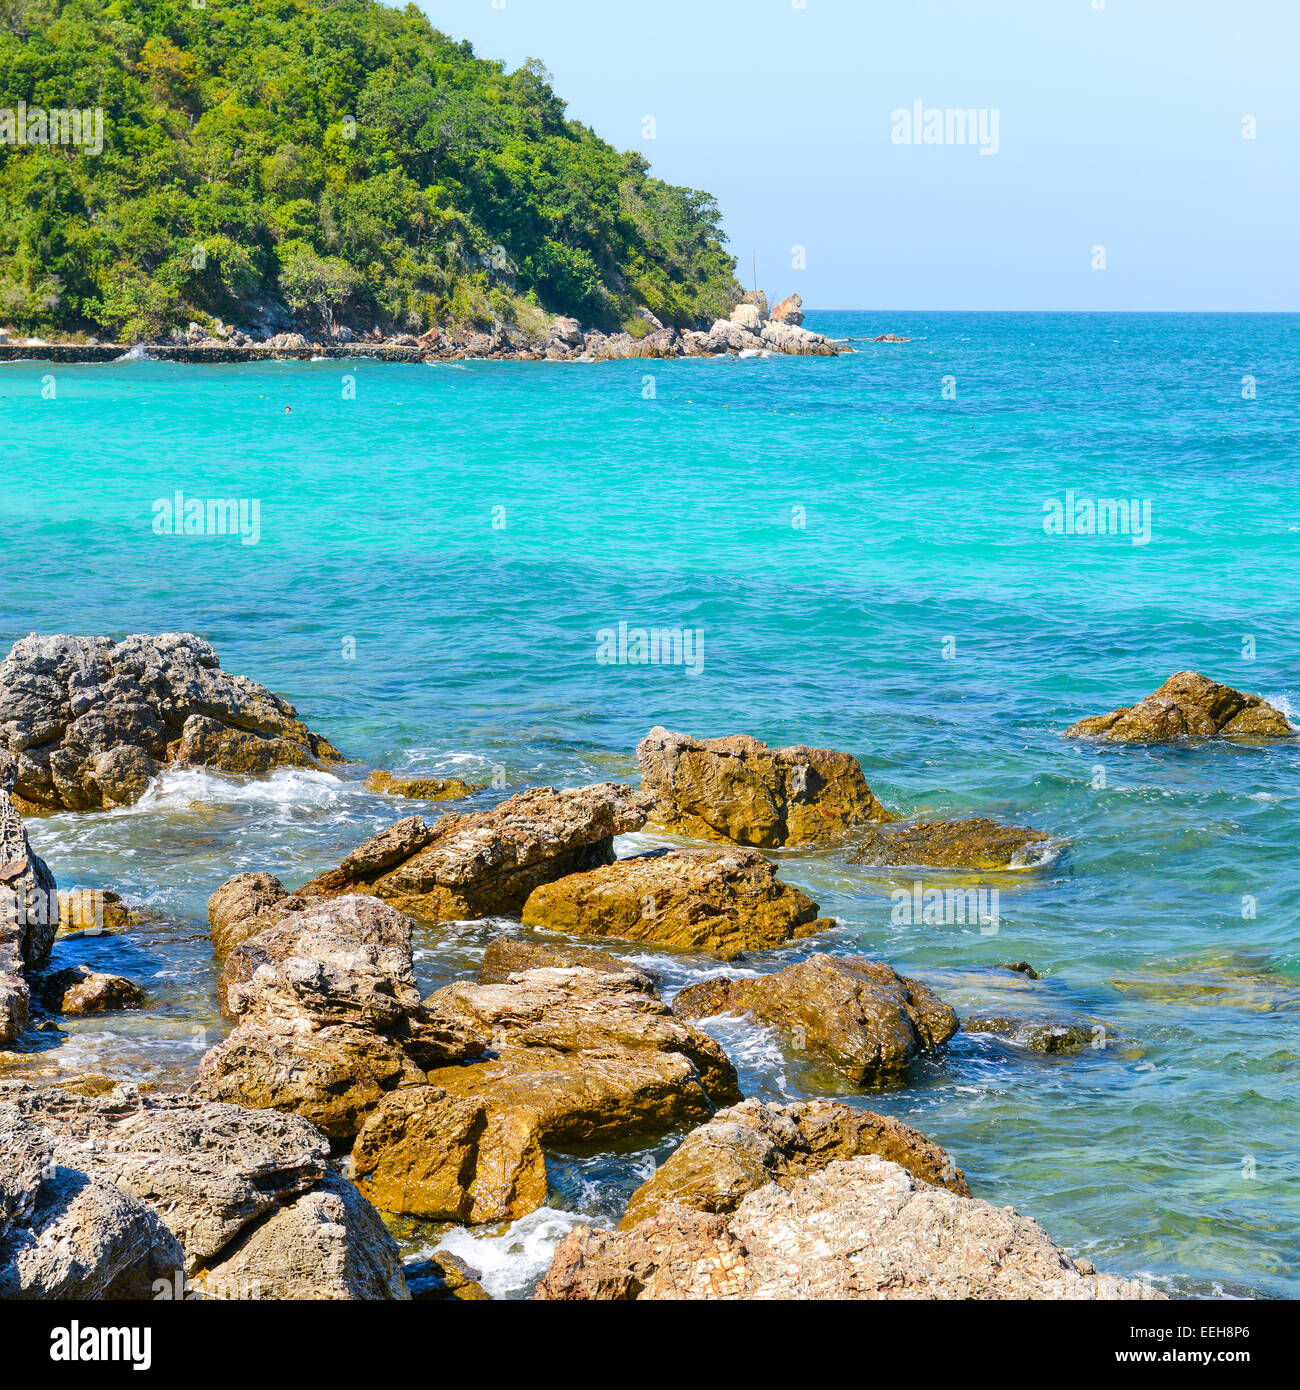 Island Beach Scenes: Nature Scene Tropical Beach And Sea In Koh Larn Island